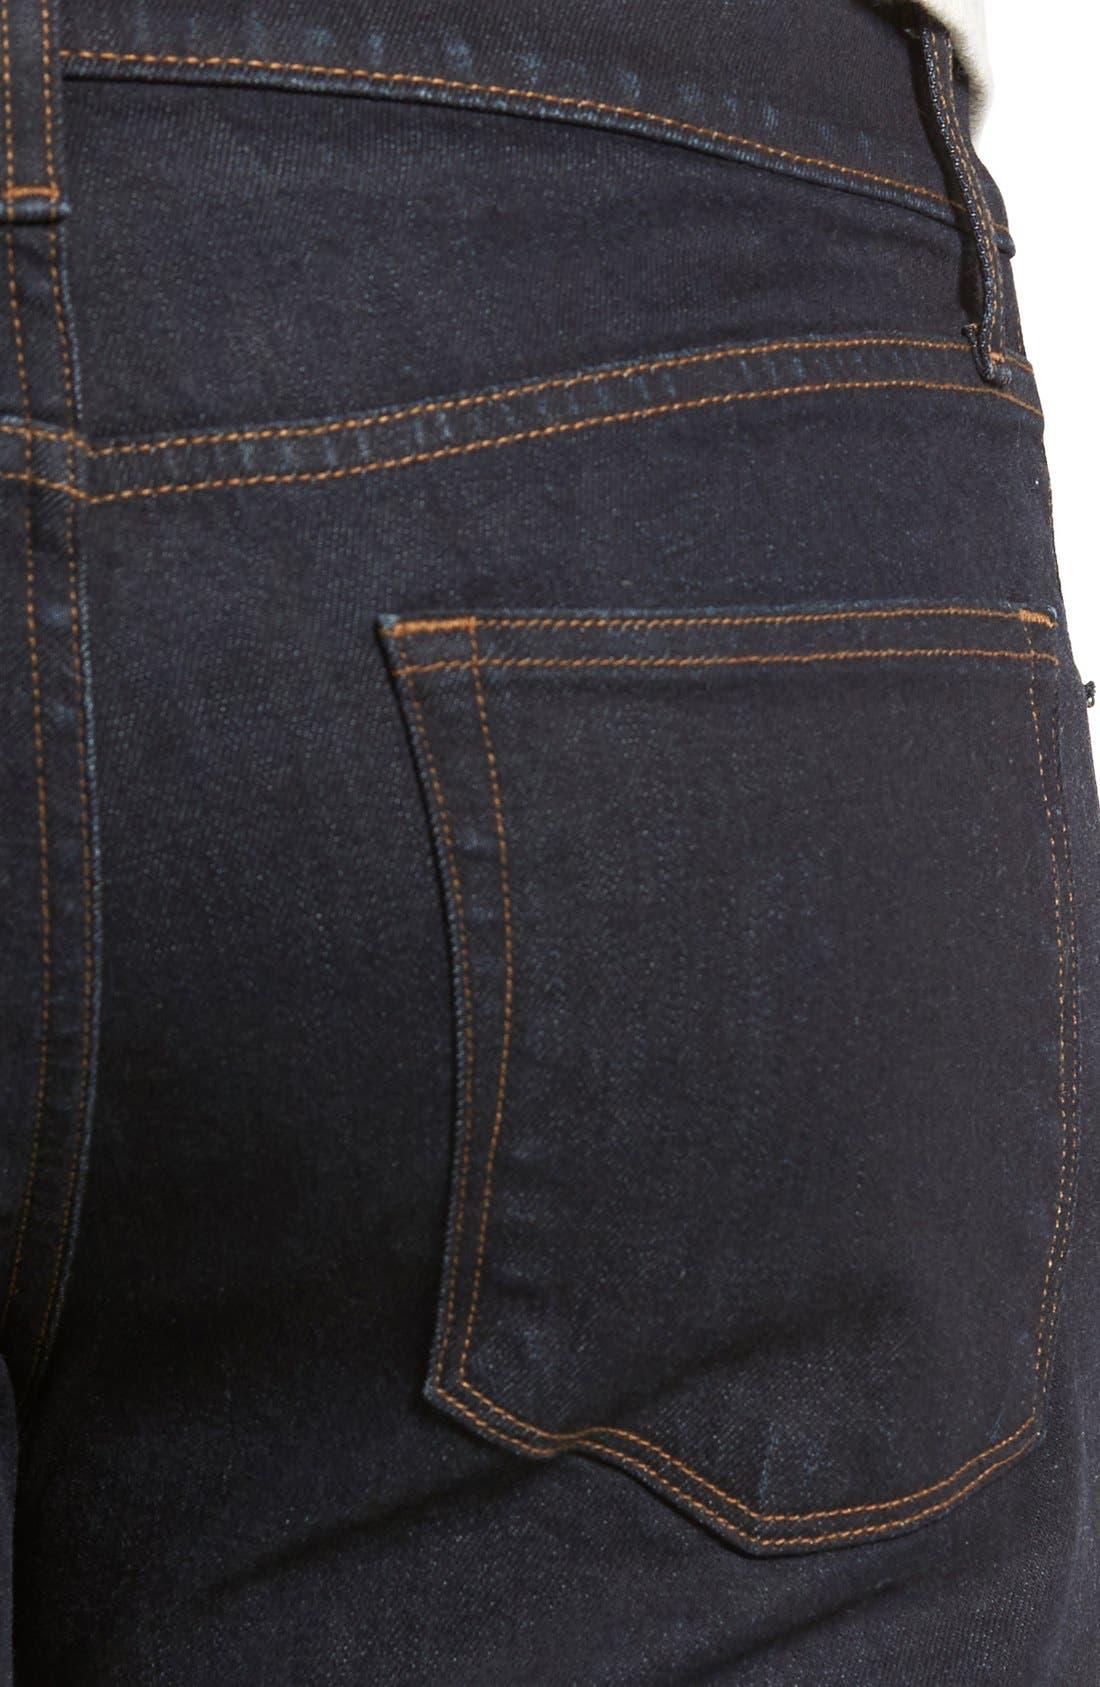 Tyler Slim Fit Jeans,                             Alternate thumbnail 6, color,                             WILSON BLUE